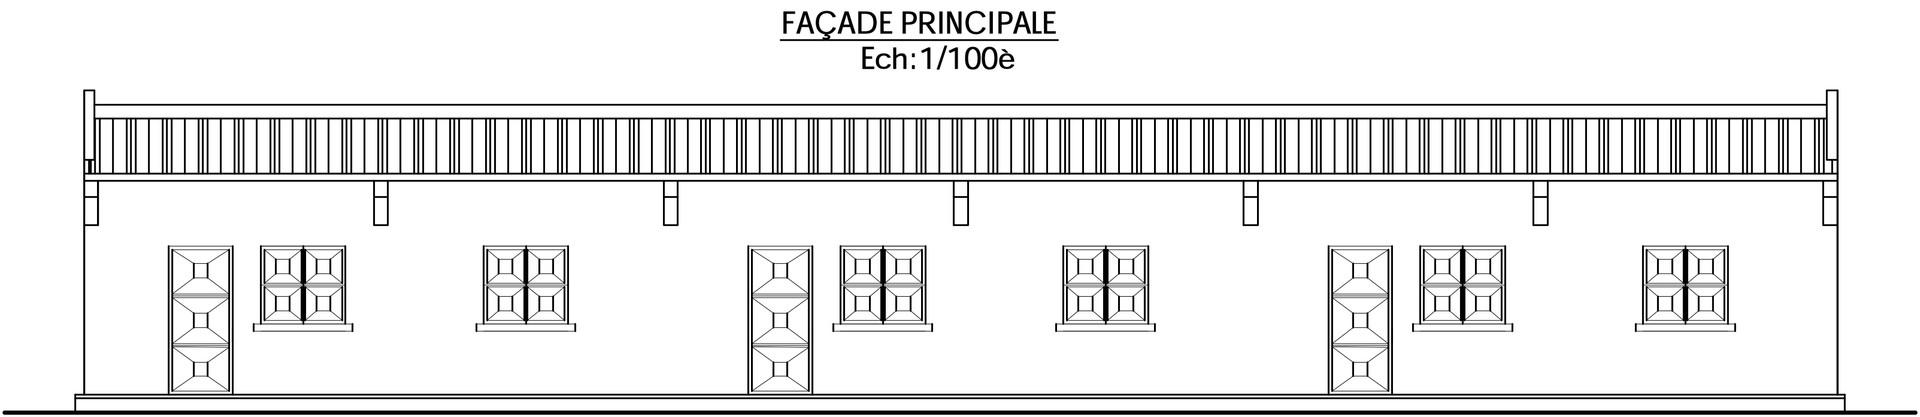 FACADE PRINCIPALE 03 SALLES DE CLASSE.jp